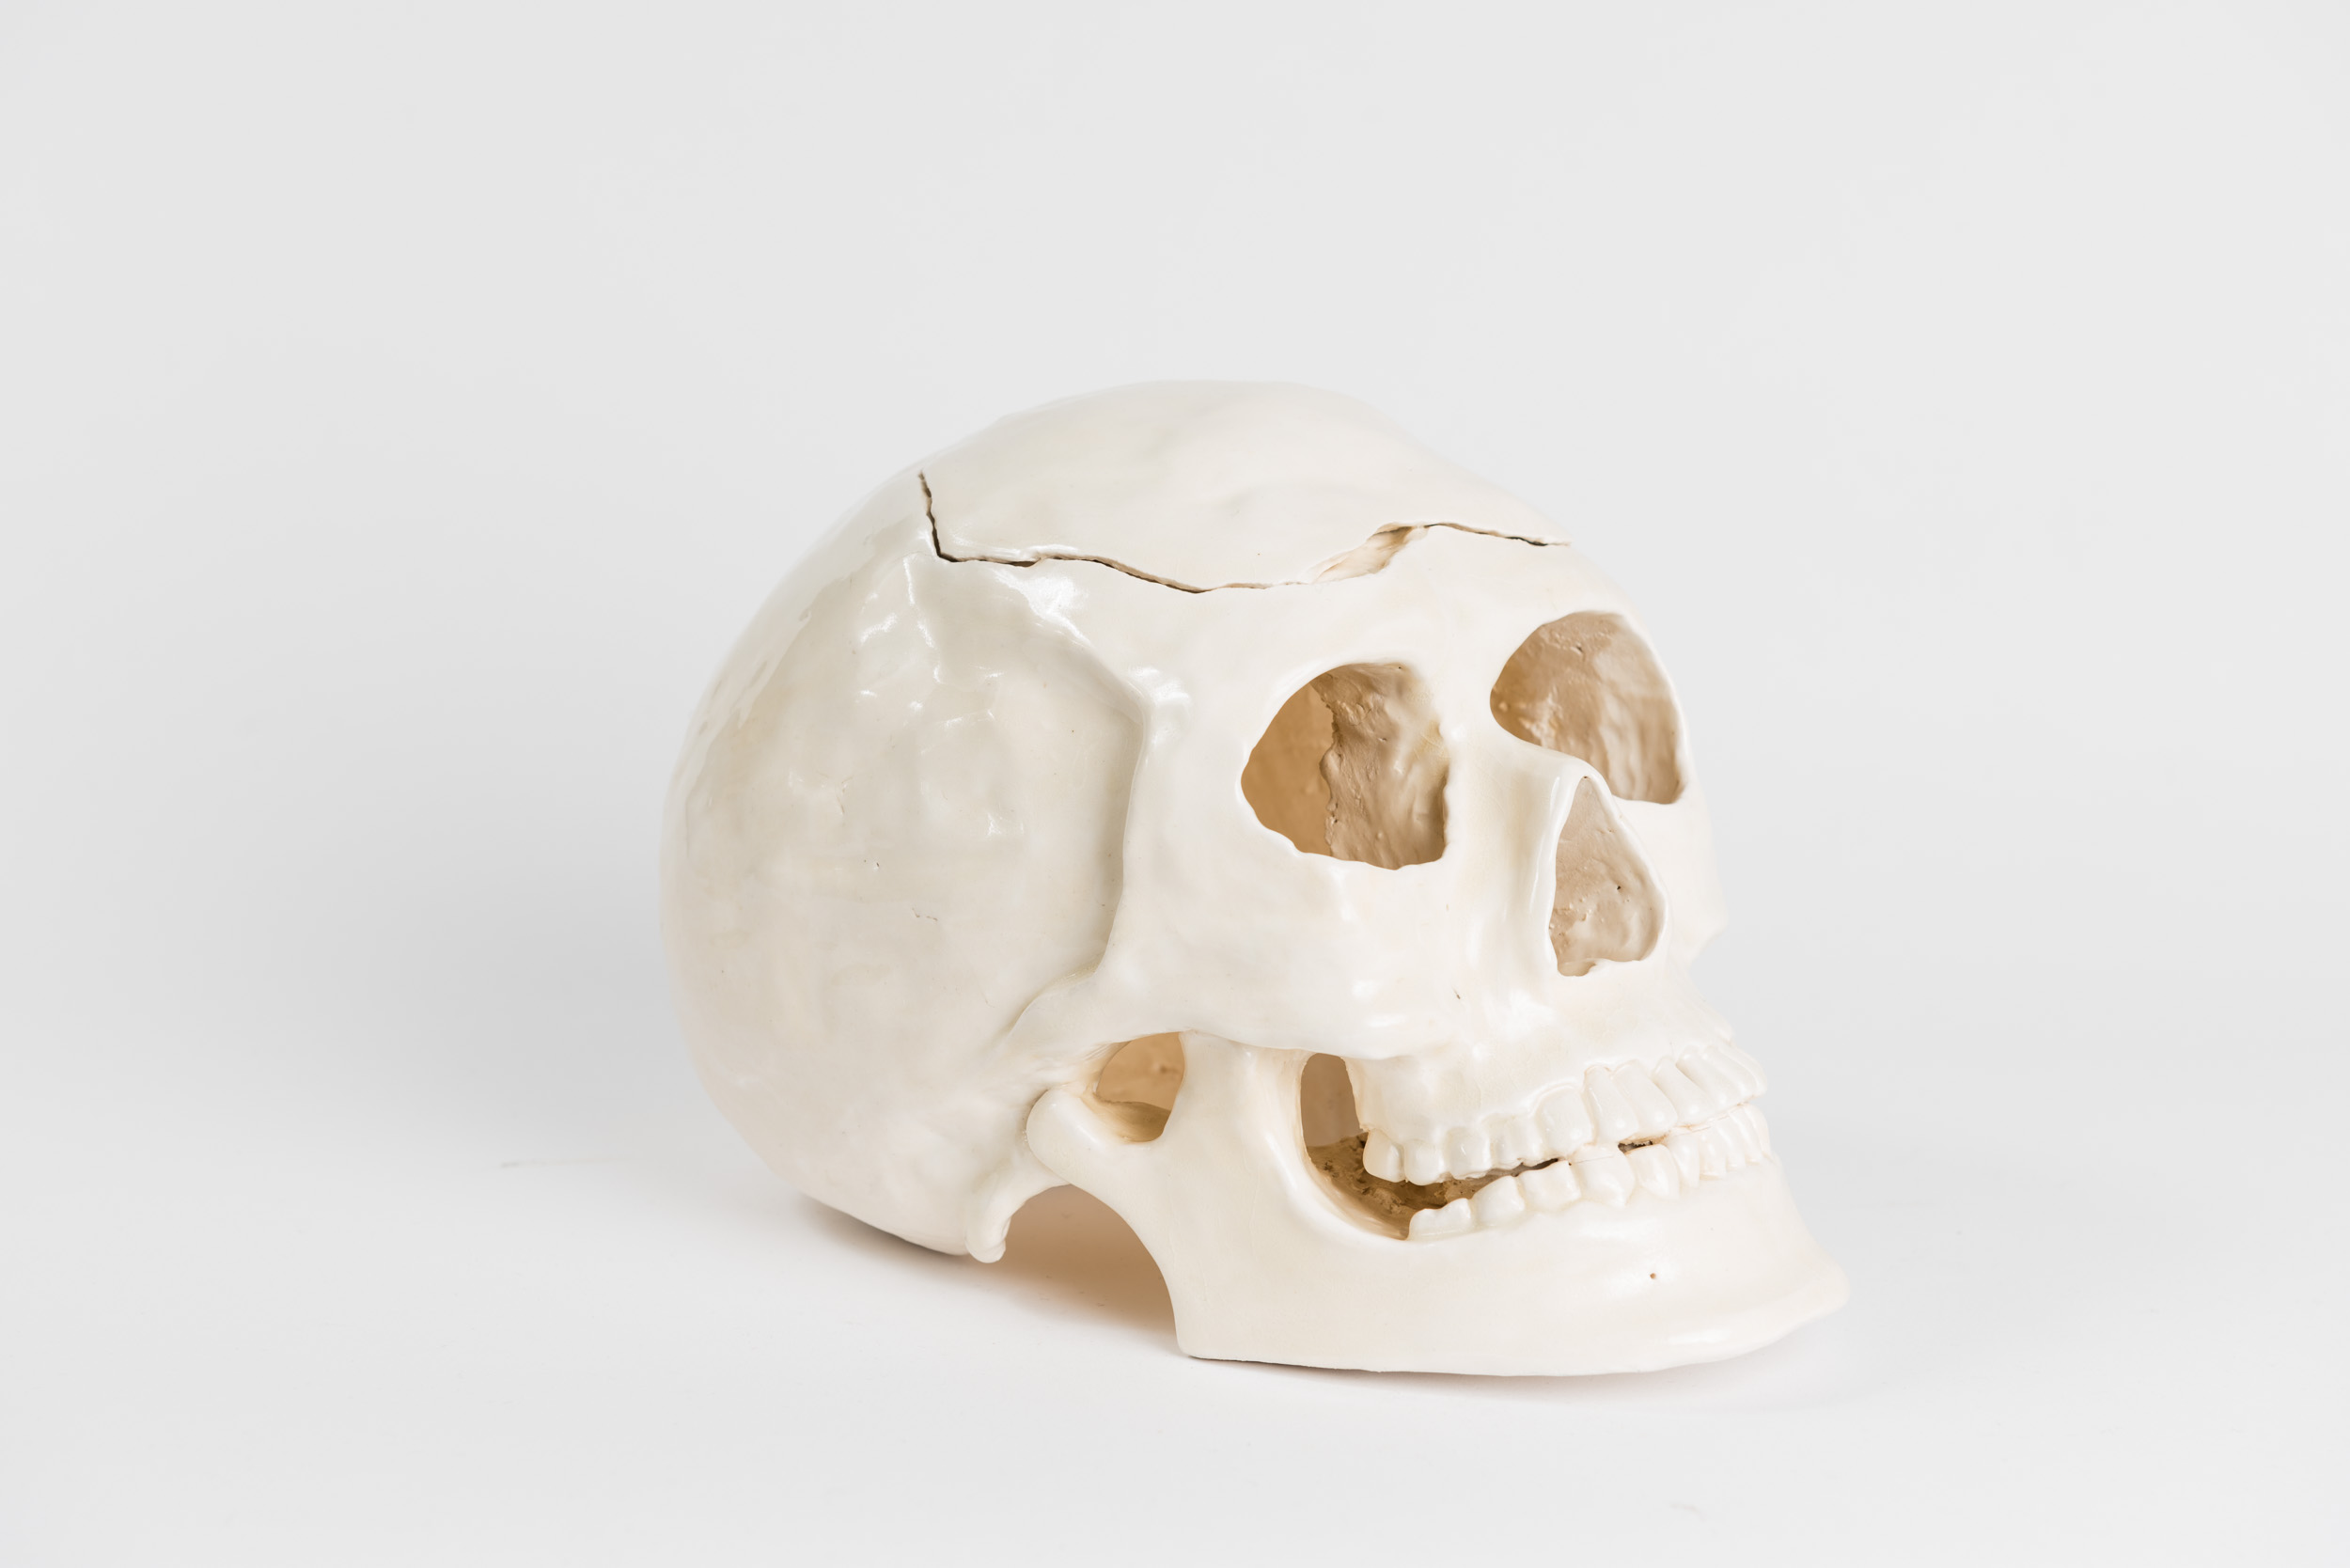 Ceramics     Hand-built ceramic skull